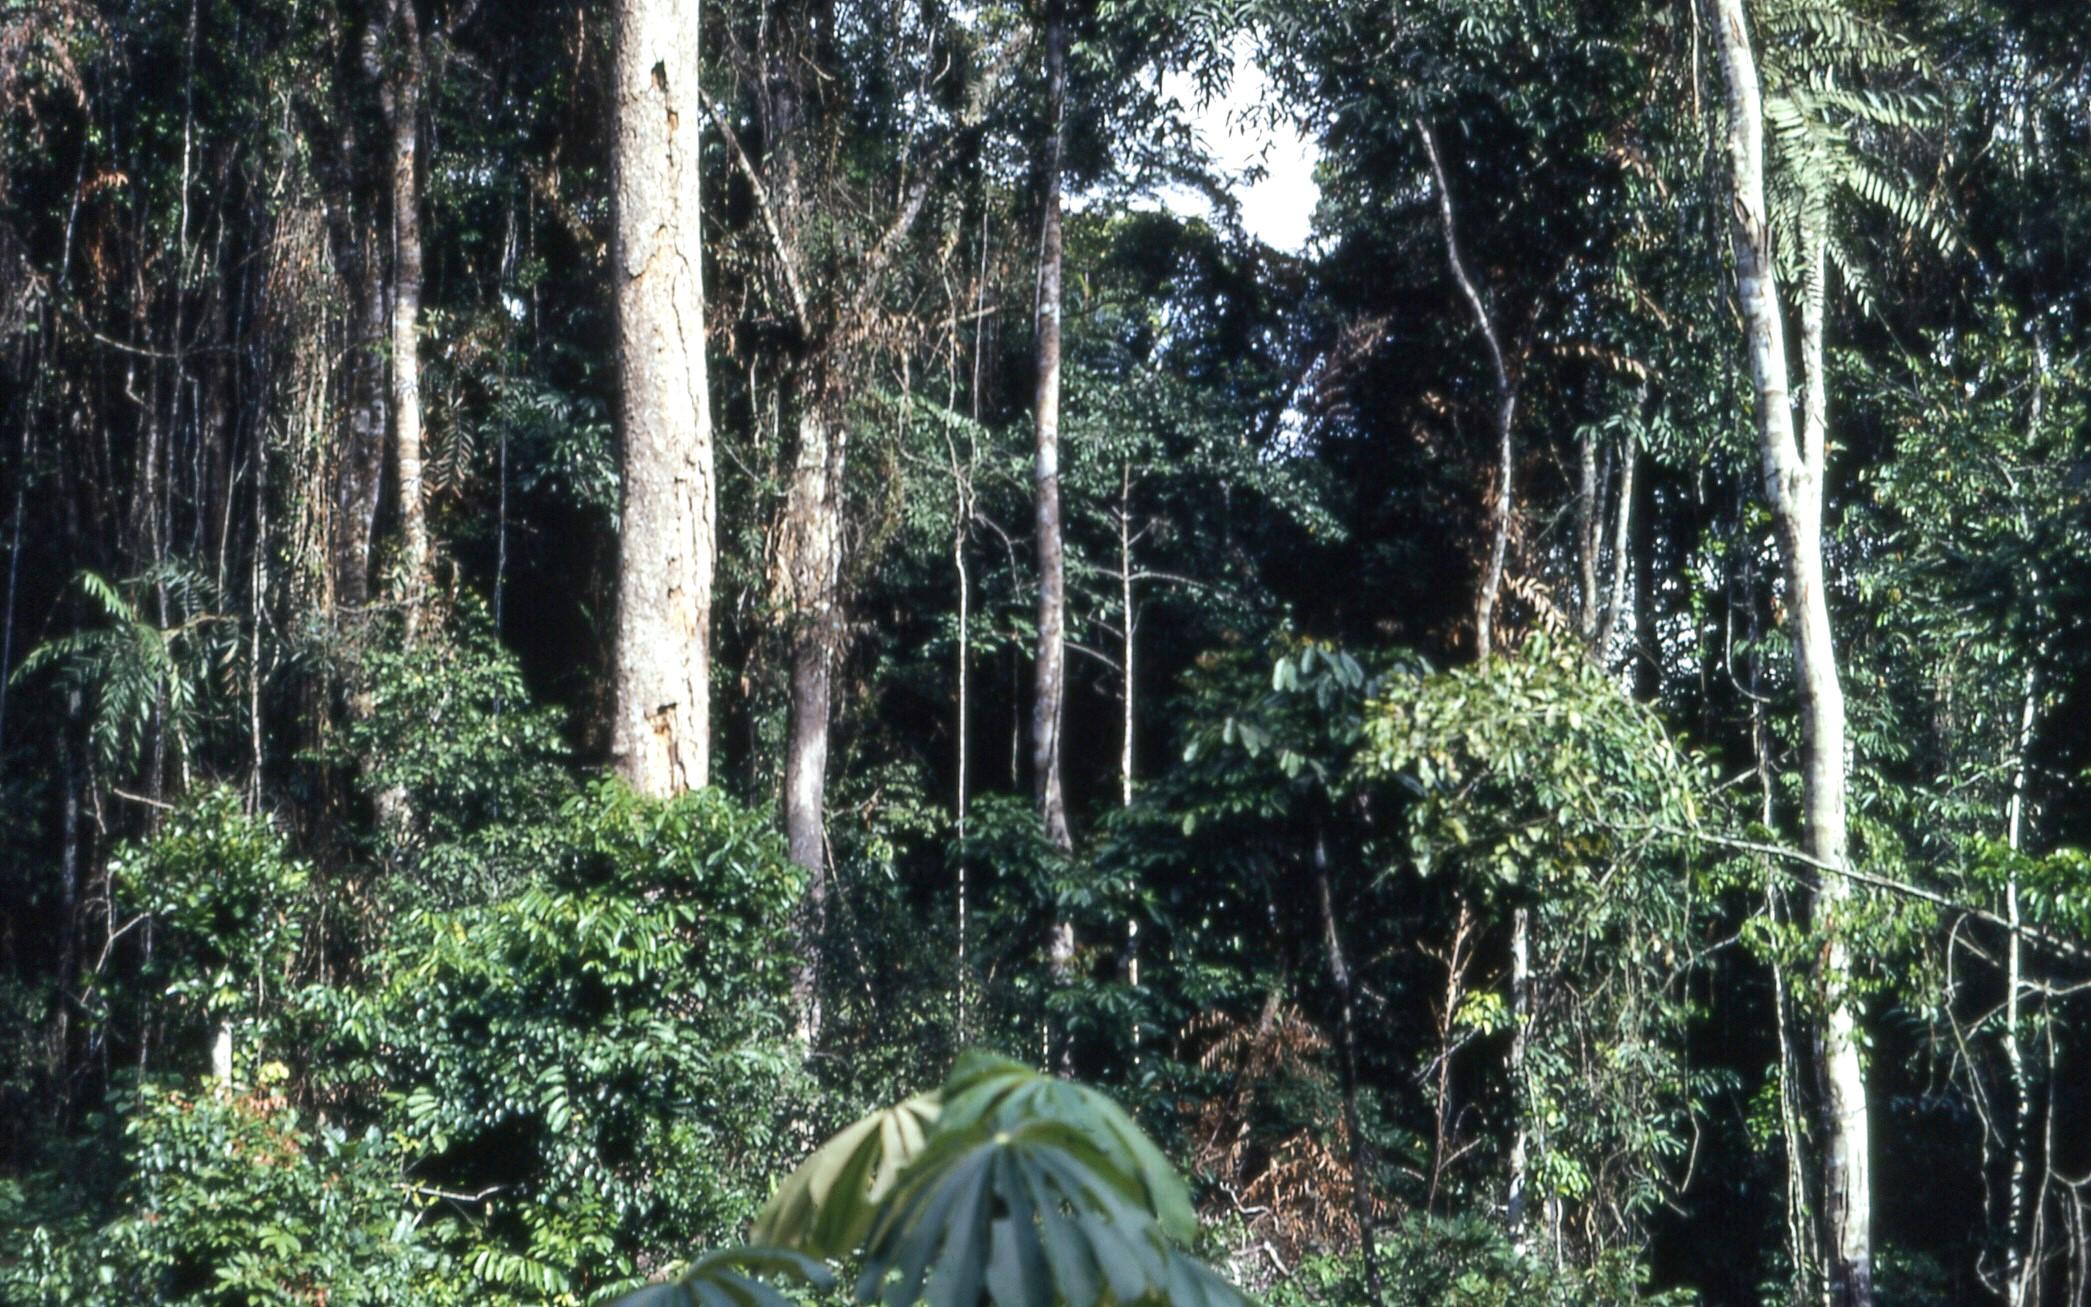 filetropical rainforest near konimbo liberia west